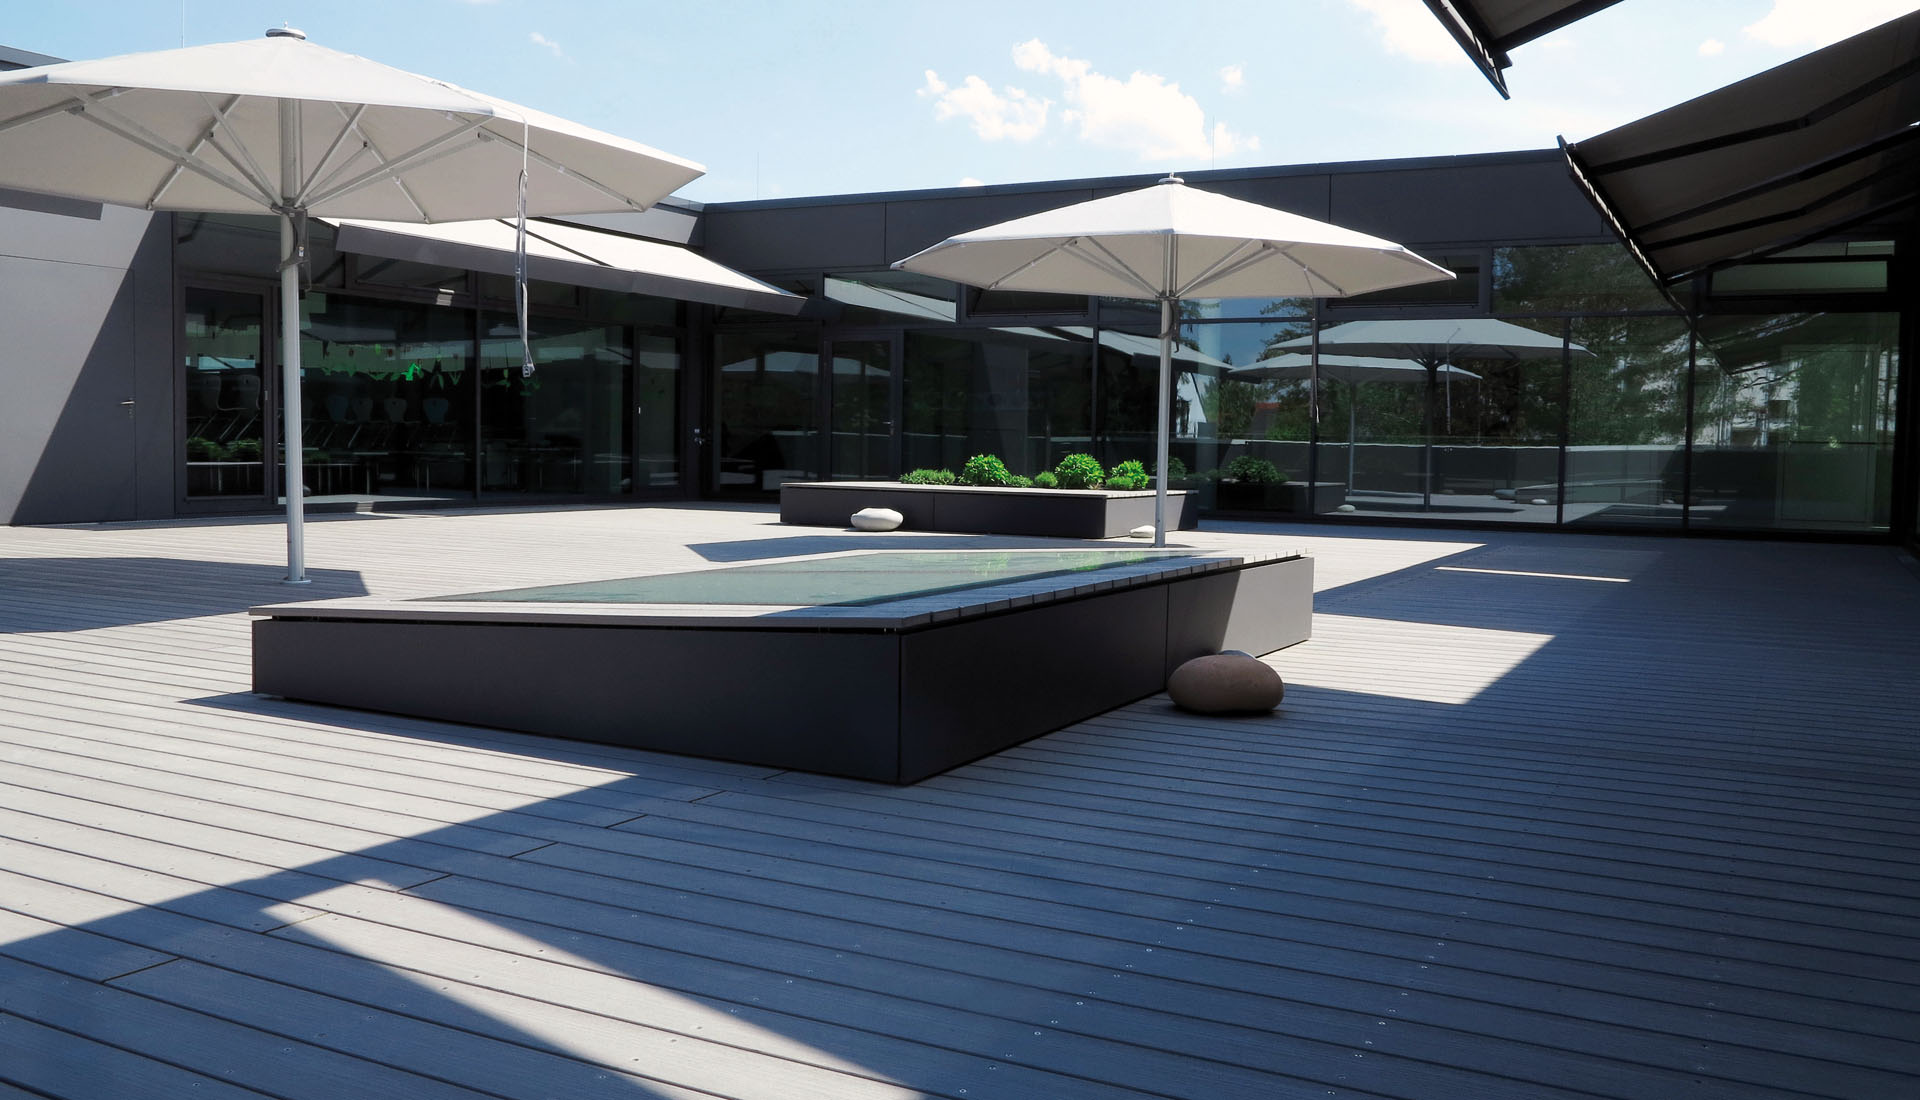 splitterfreie terrassendielen f r die grundschule. Black Bedroom Furniture Sets. Home Design Ideas